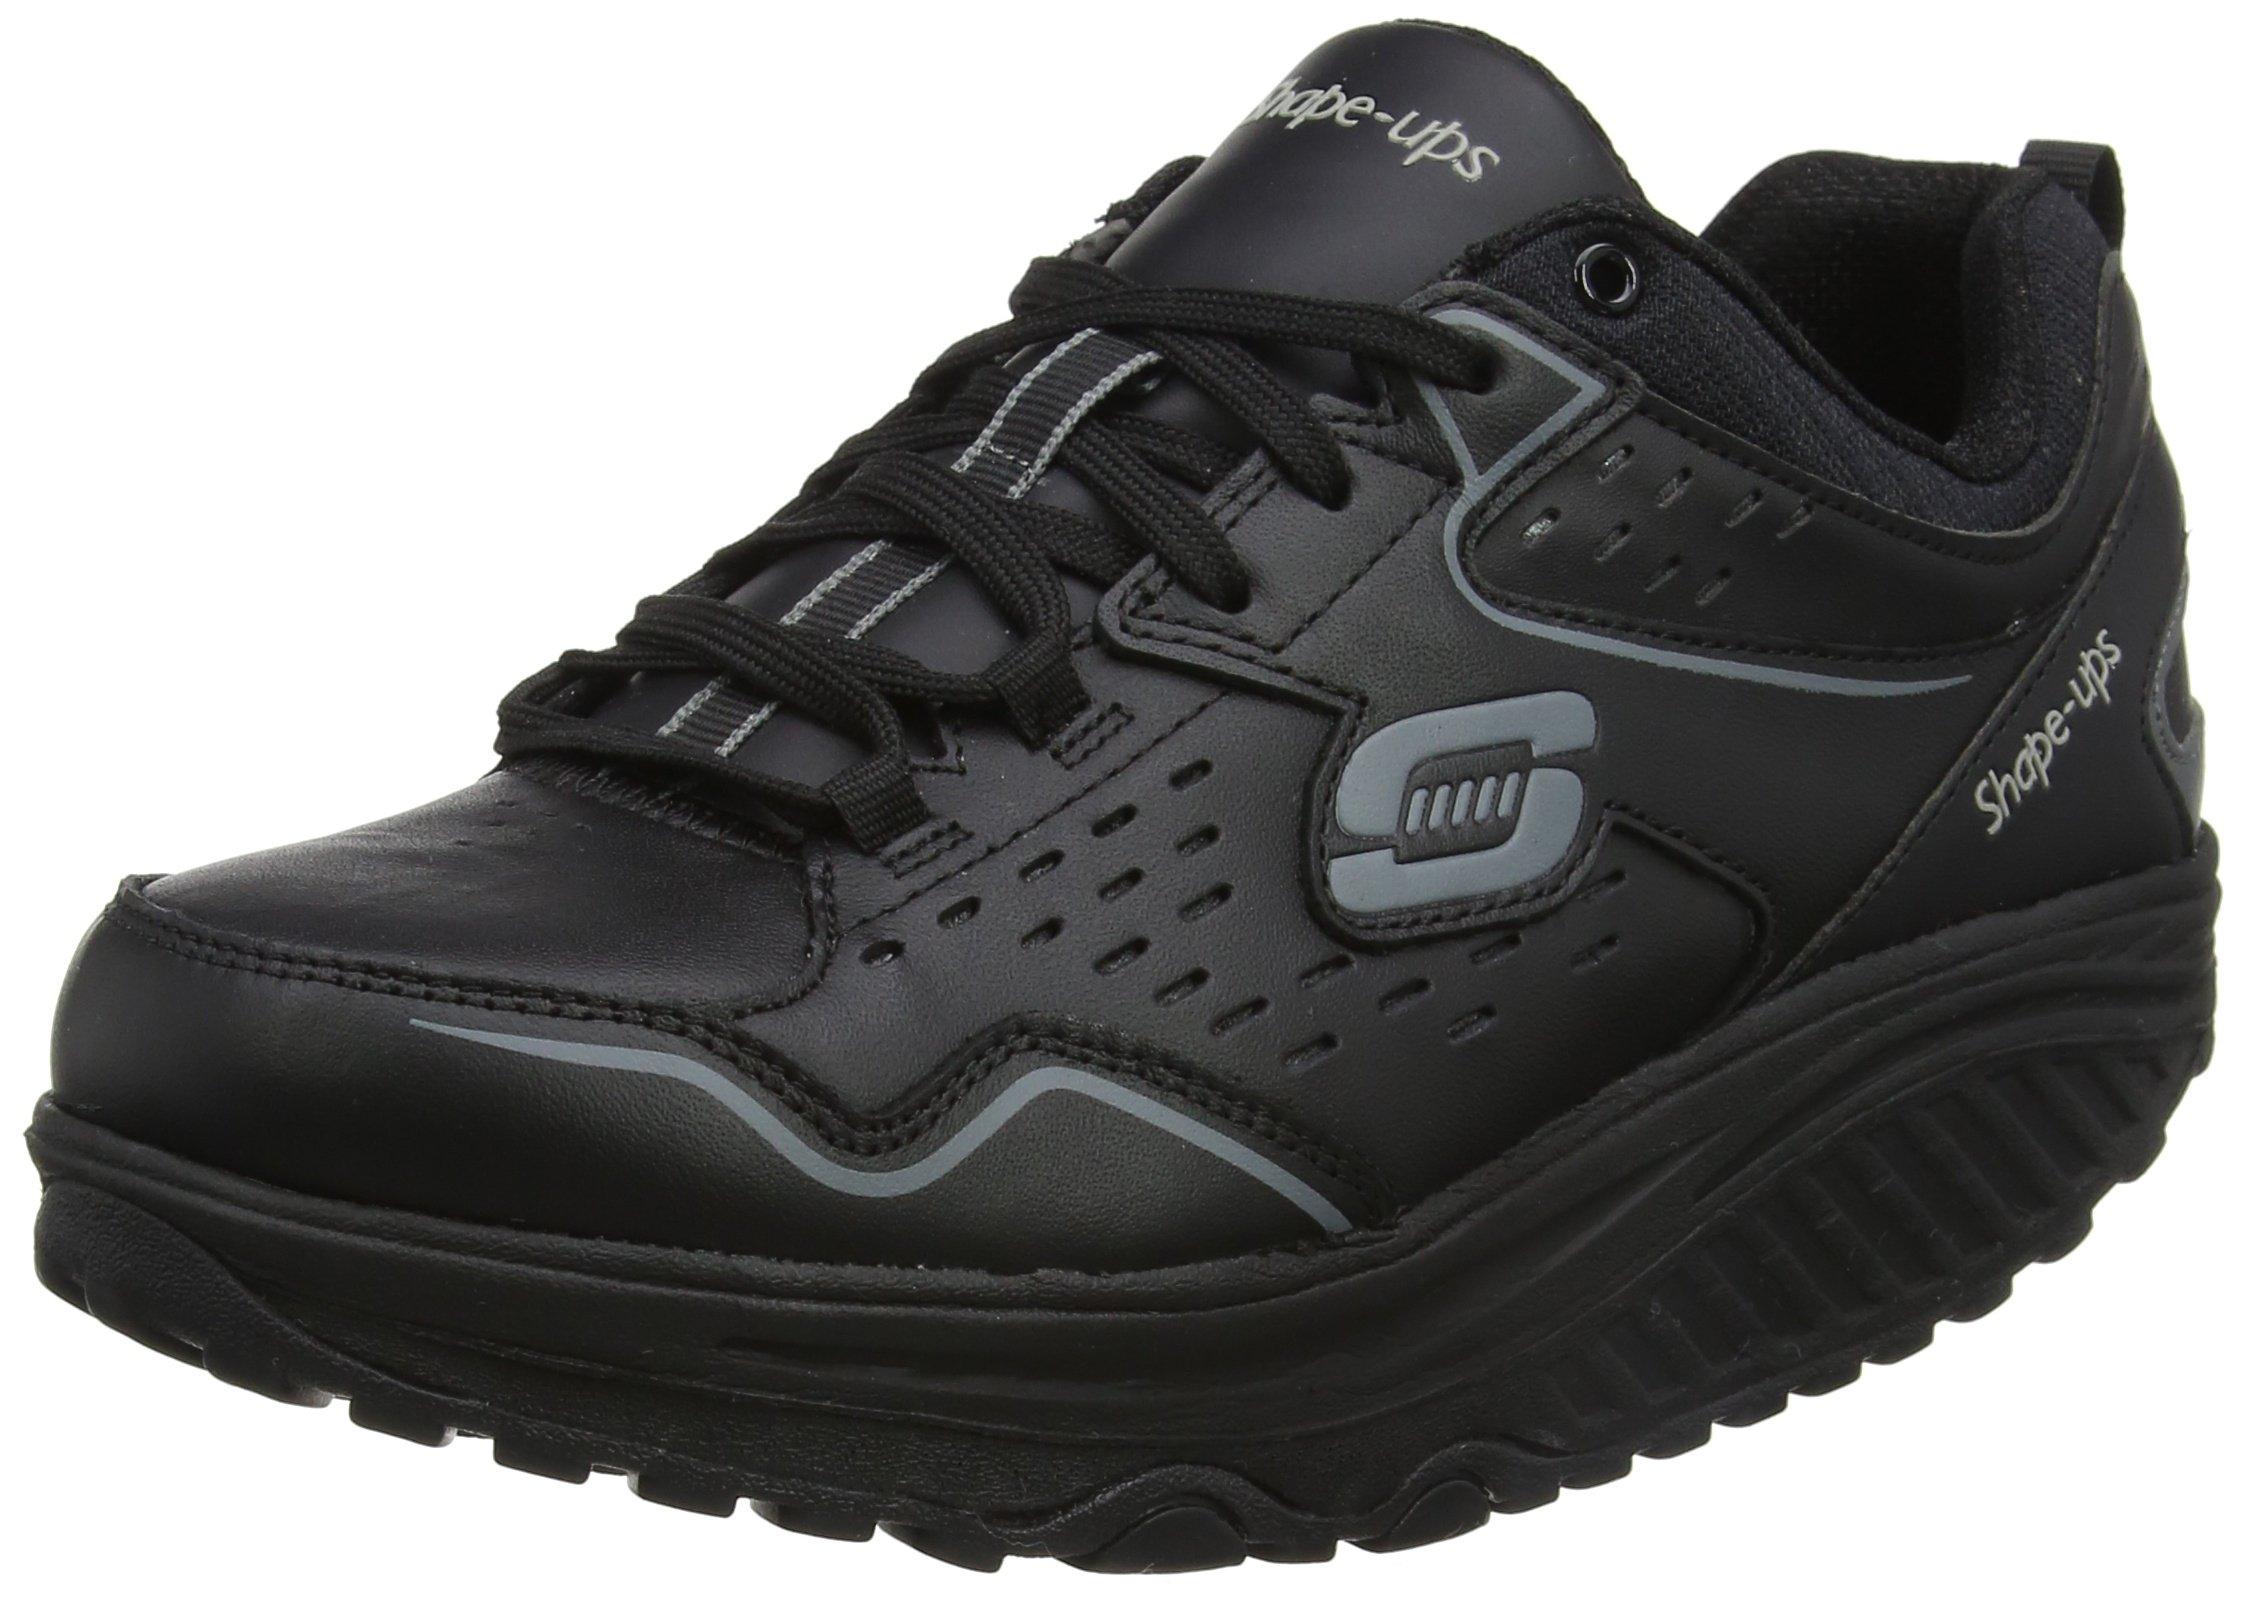 Skechers Women's Shape Ups 2.0 Perfect Comfort Fashion Sneaker, Black, 7.5 M US